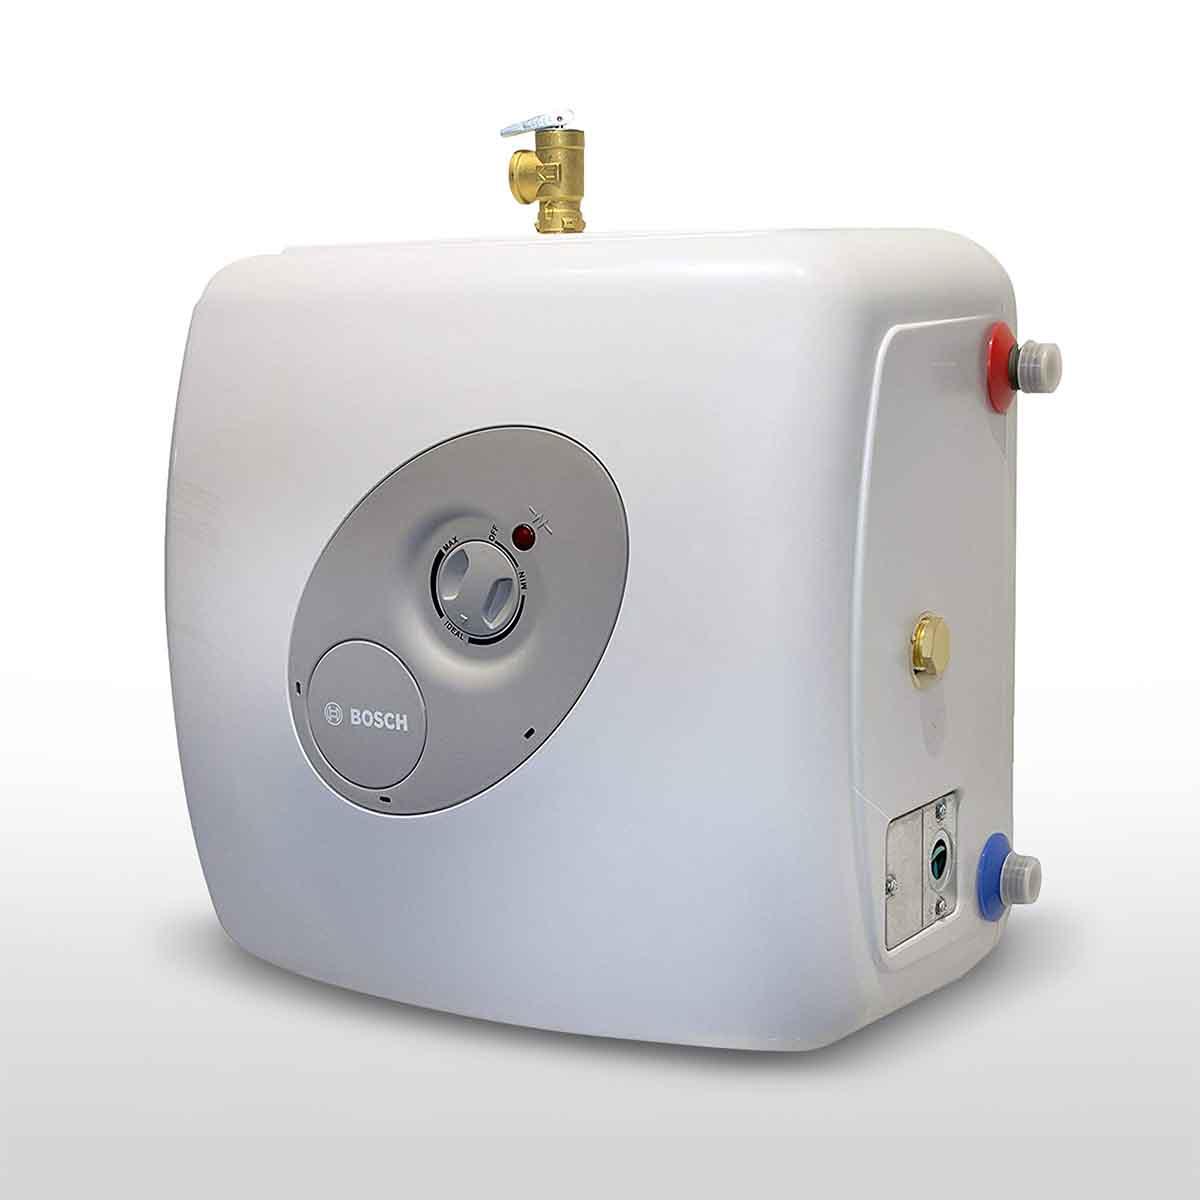 Calentador Deposito electronico 1 1/2 Servicios 27 L Bosch